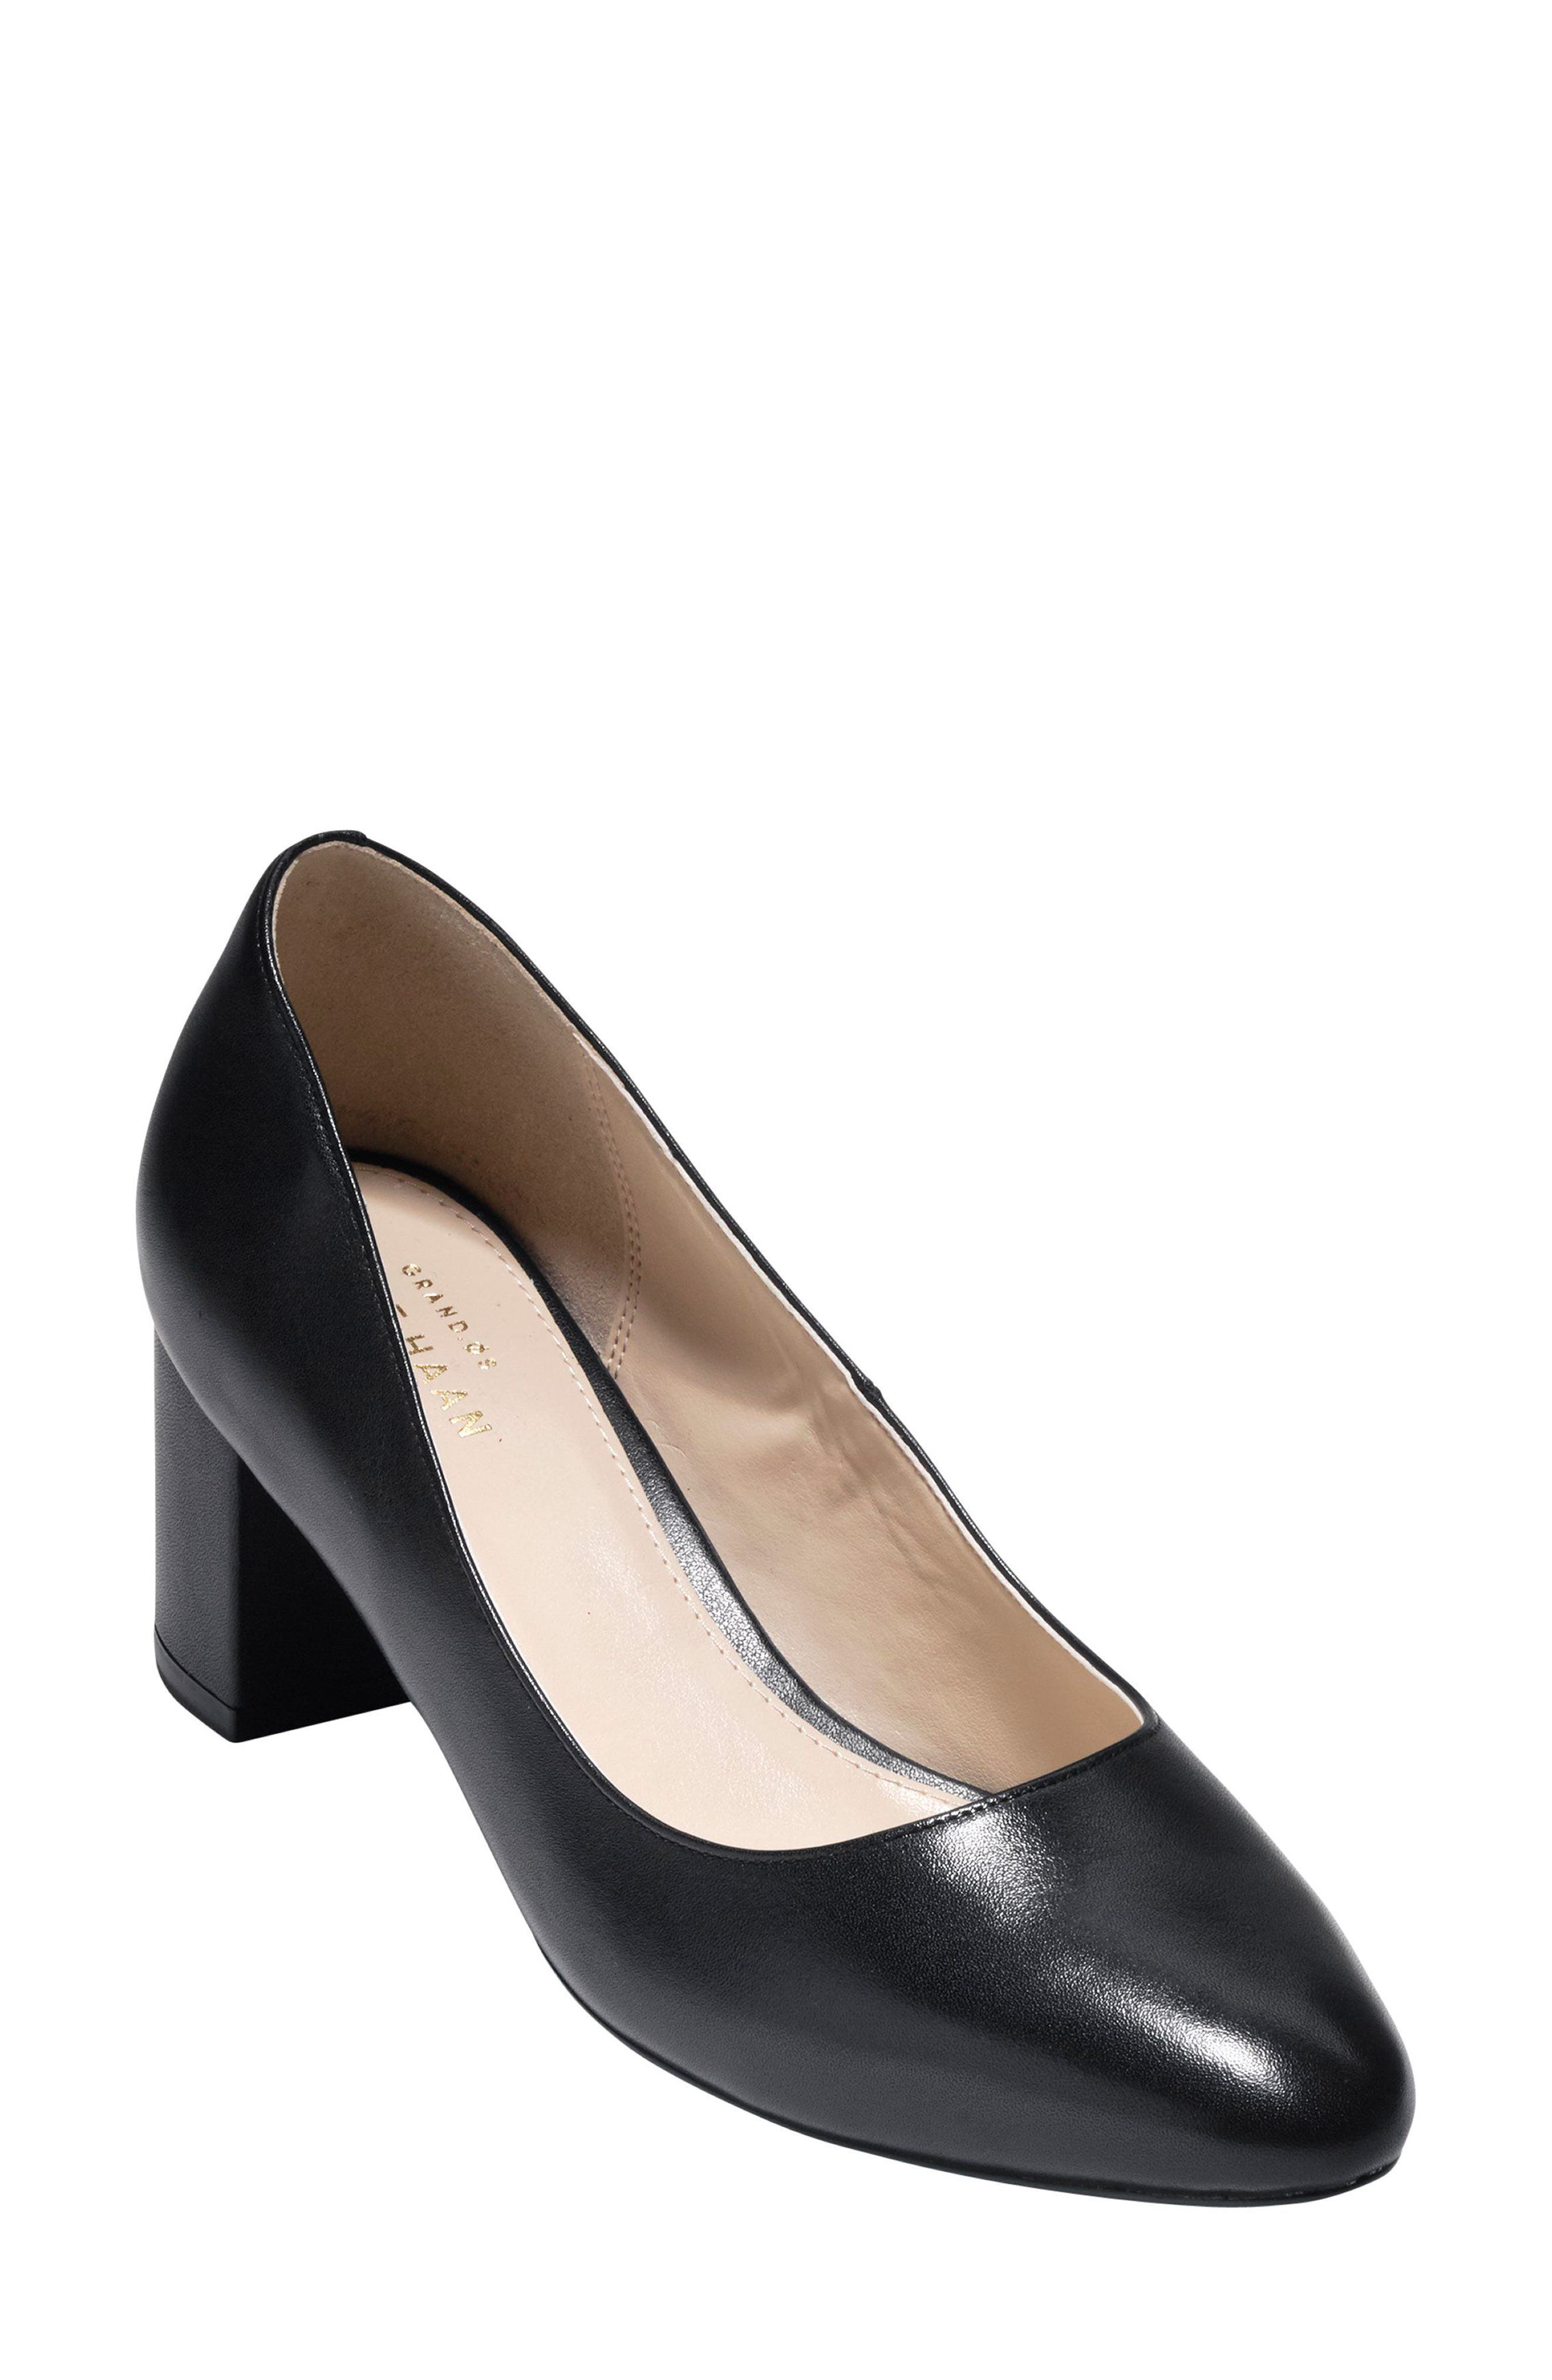 Justine Block Heel Pump,                             Main thumbnail 1, color,                             Black Leather